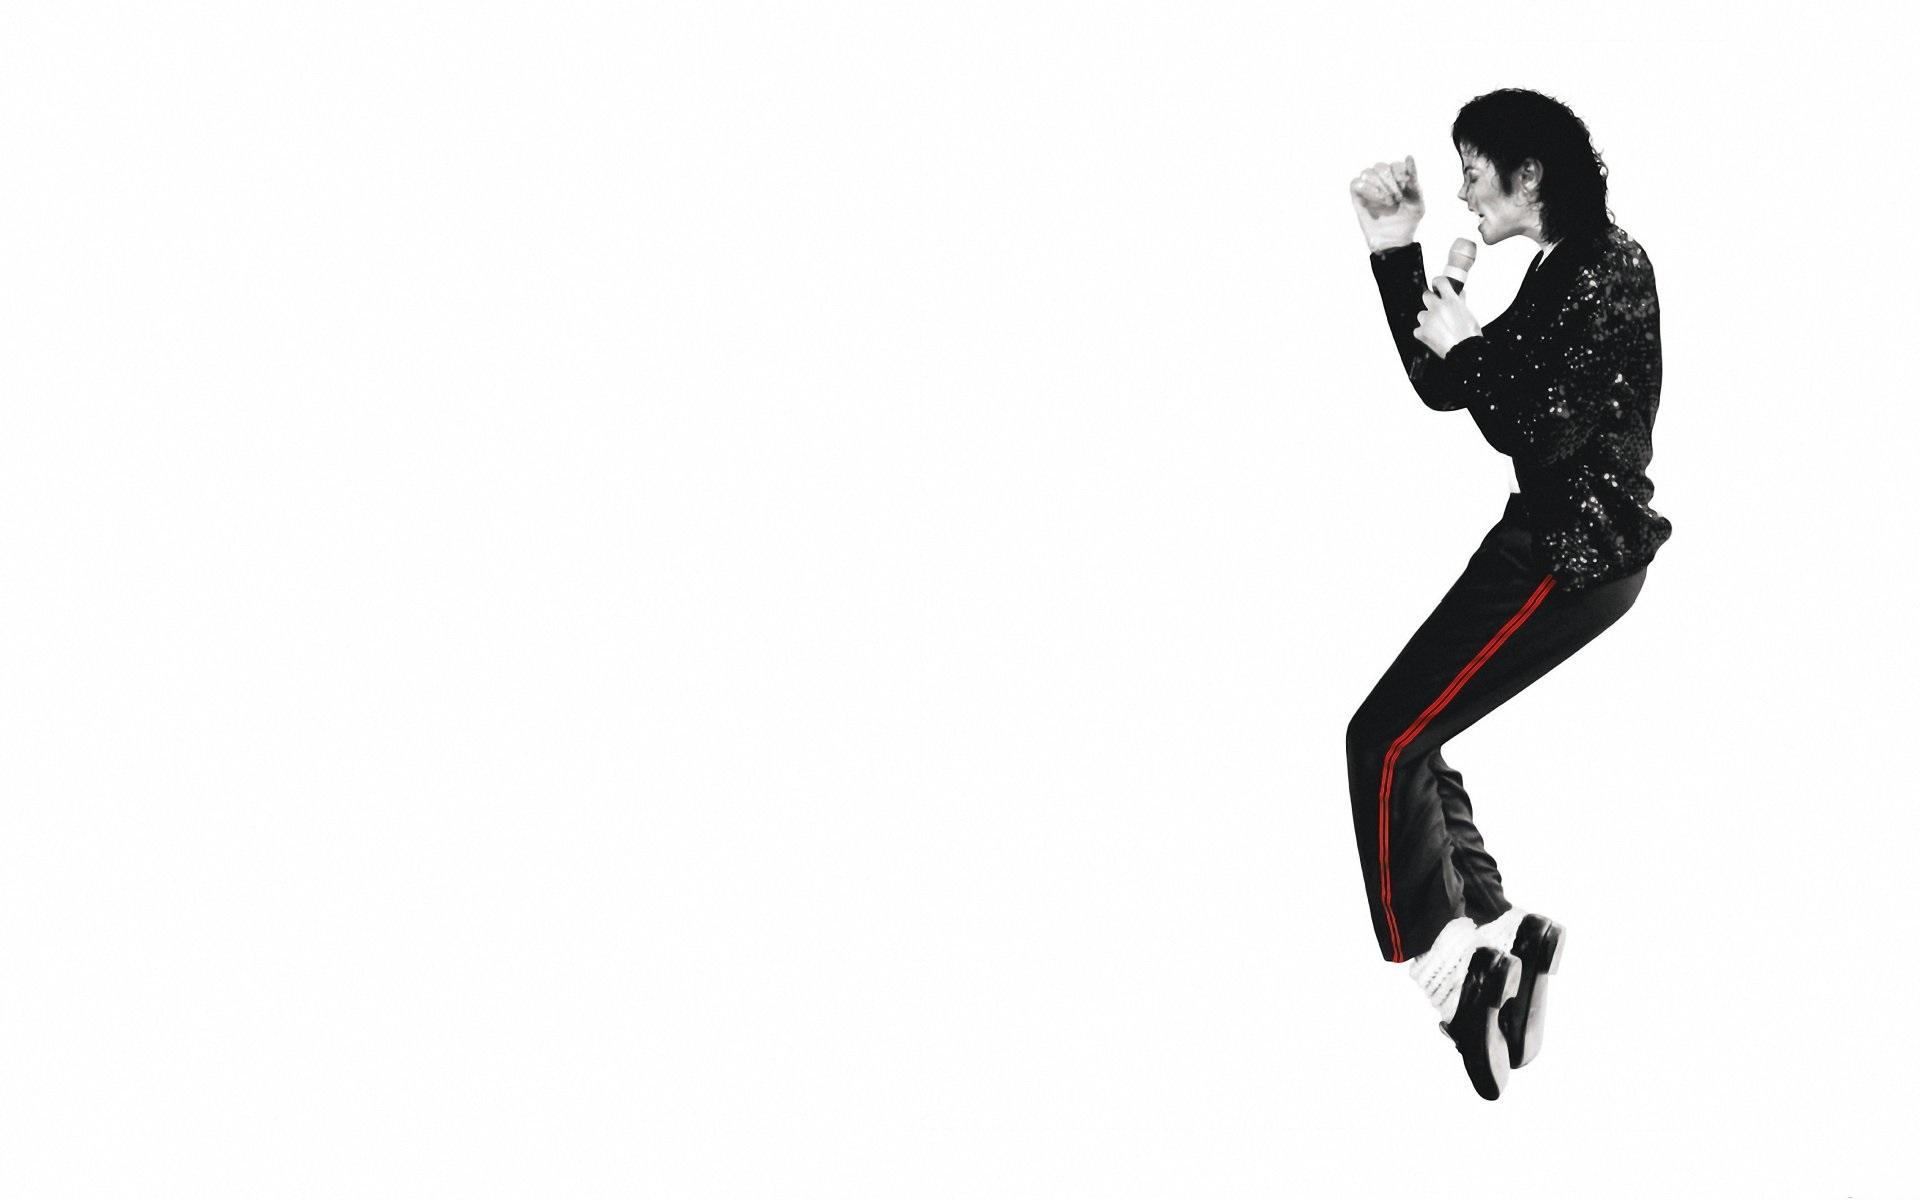 michael jackson dancejpg